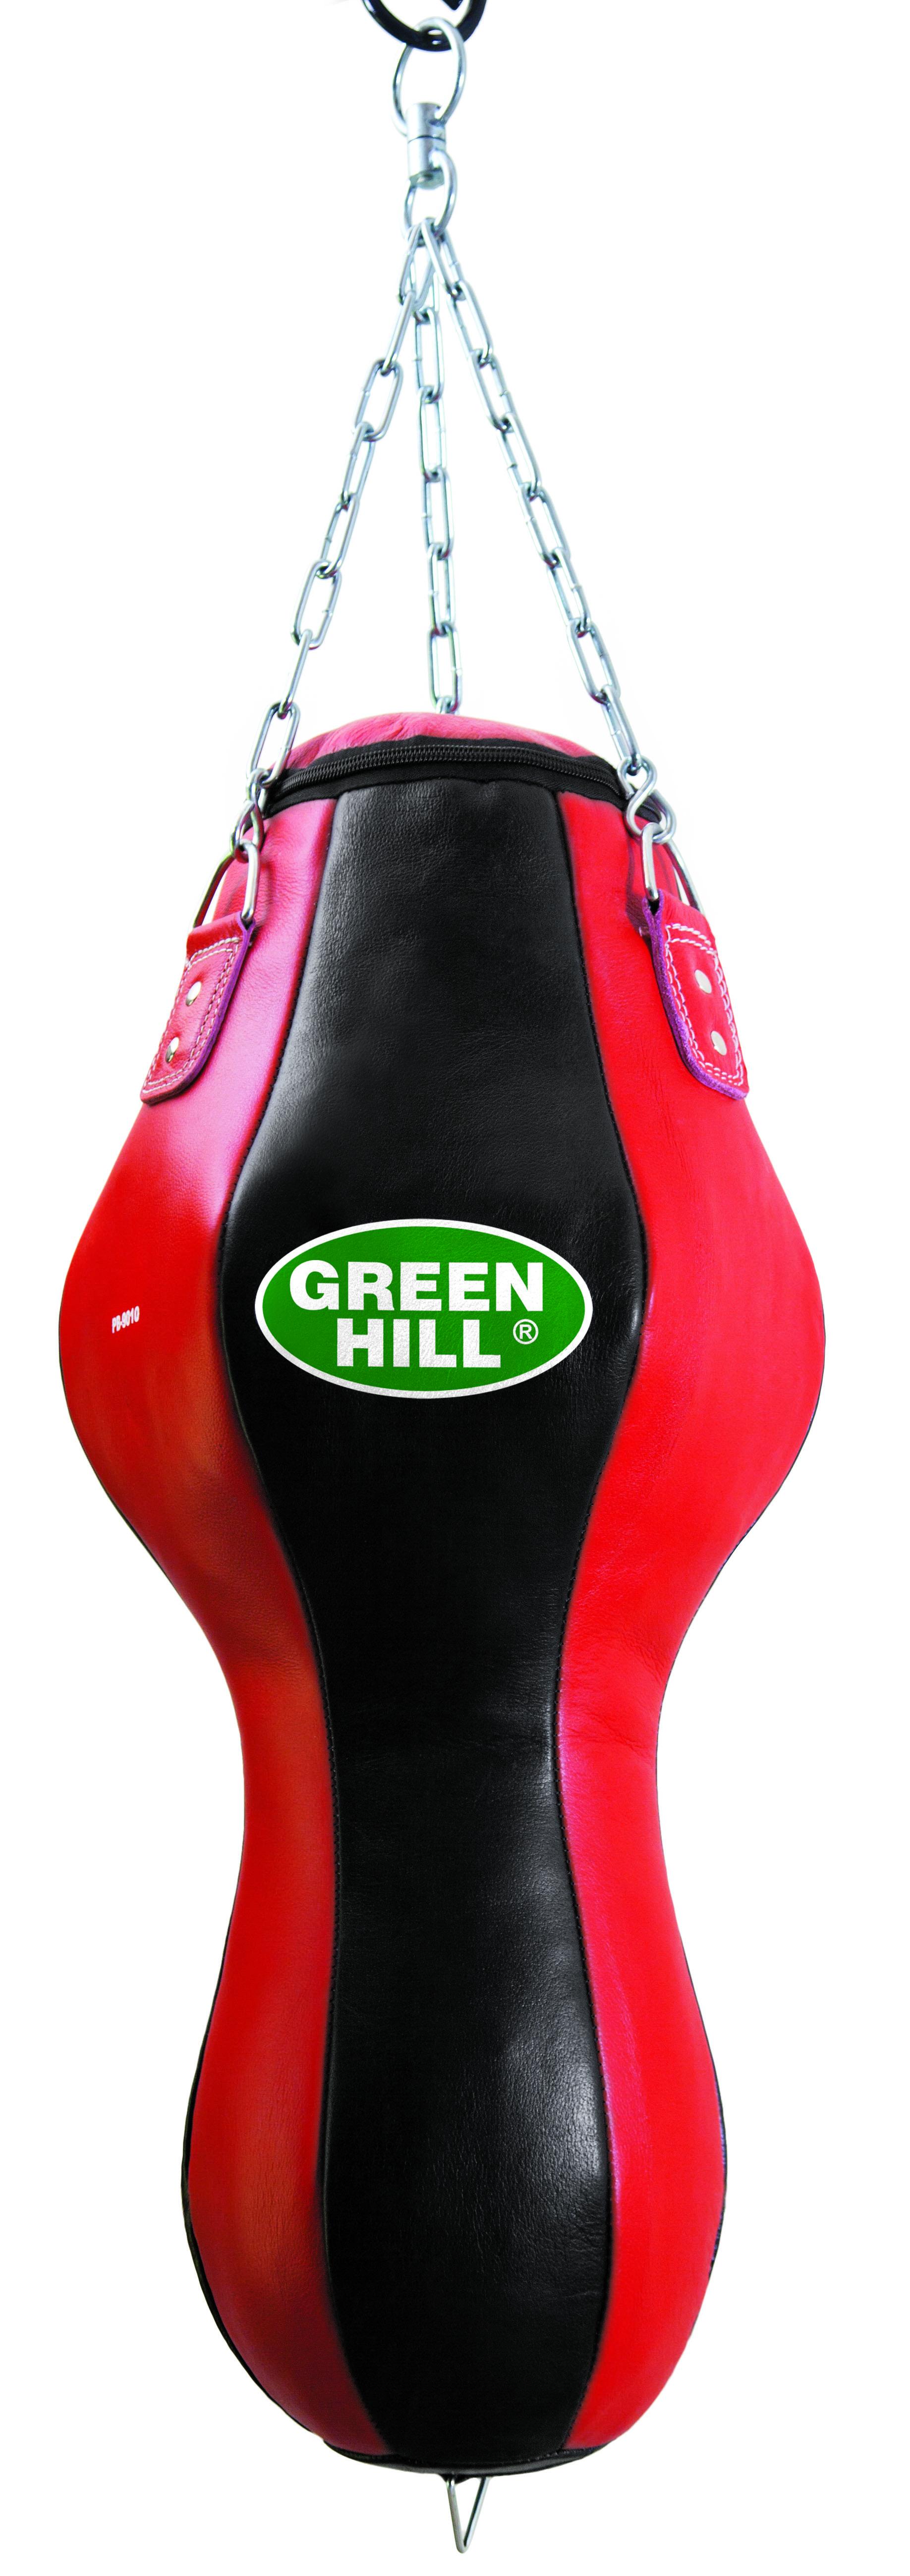 Green Hill Мешок набивной фигурный Green Hill, 38 кг green hill ракетка для тхэквондо green hill single